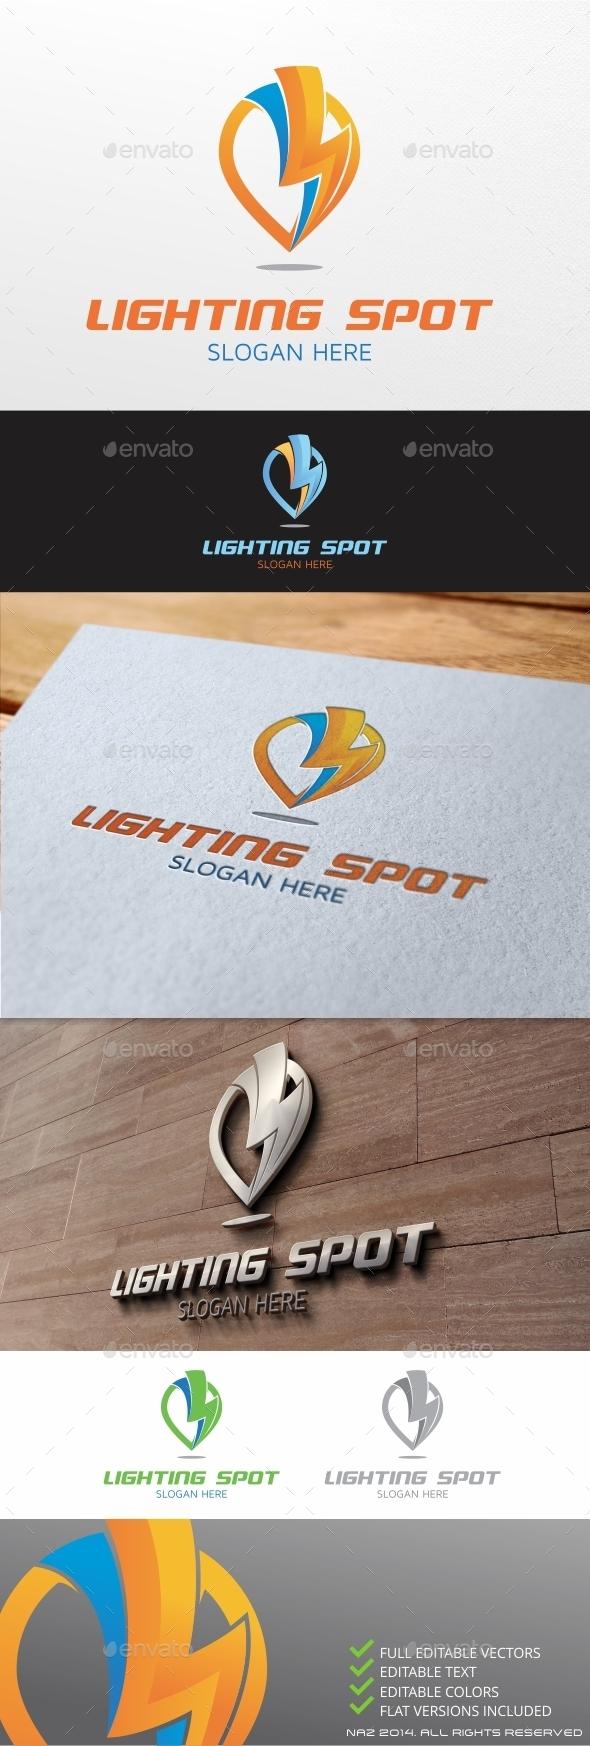 GraphicRiver Lightning Spot Logo 9895845